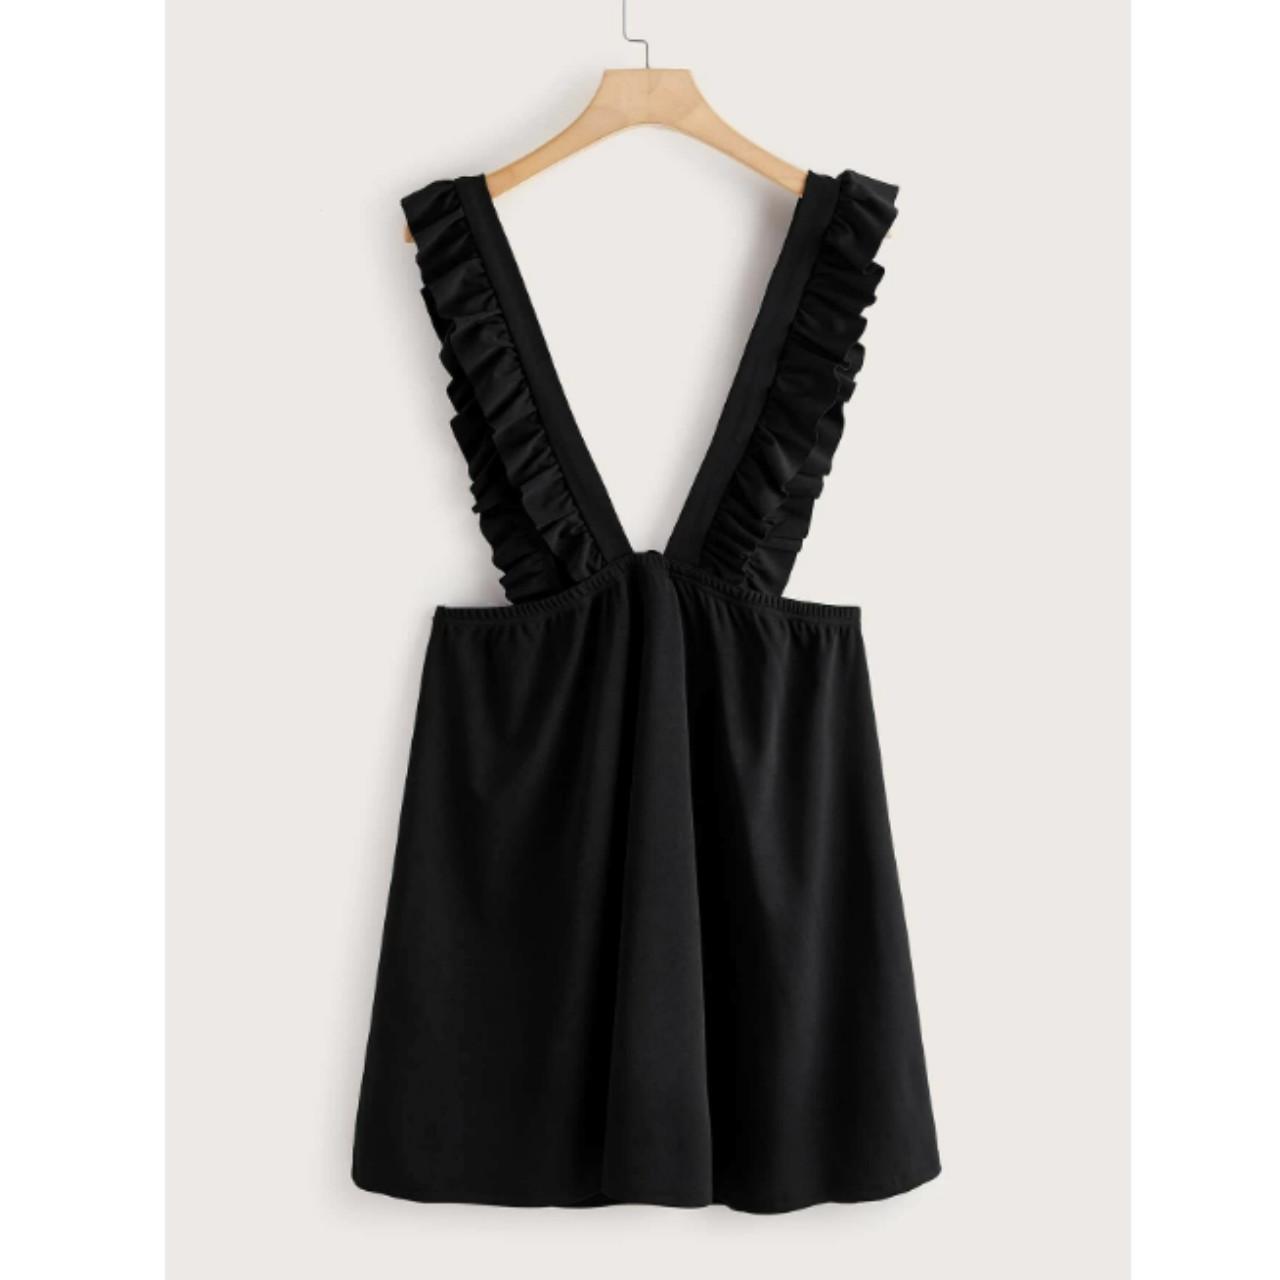 Plus ruffle strap suspender dress 2xl